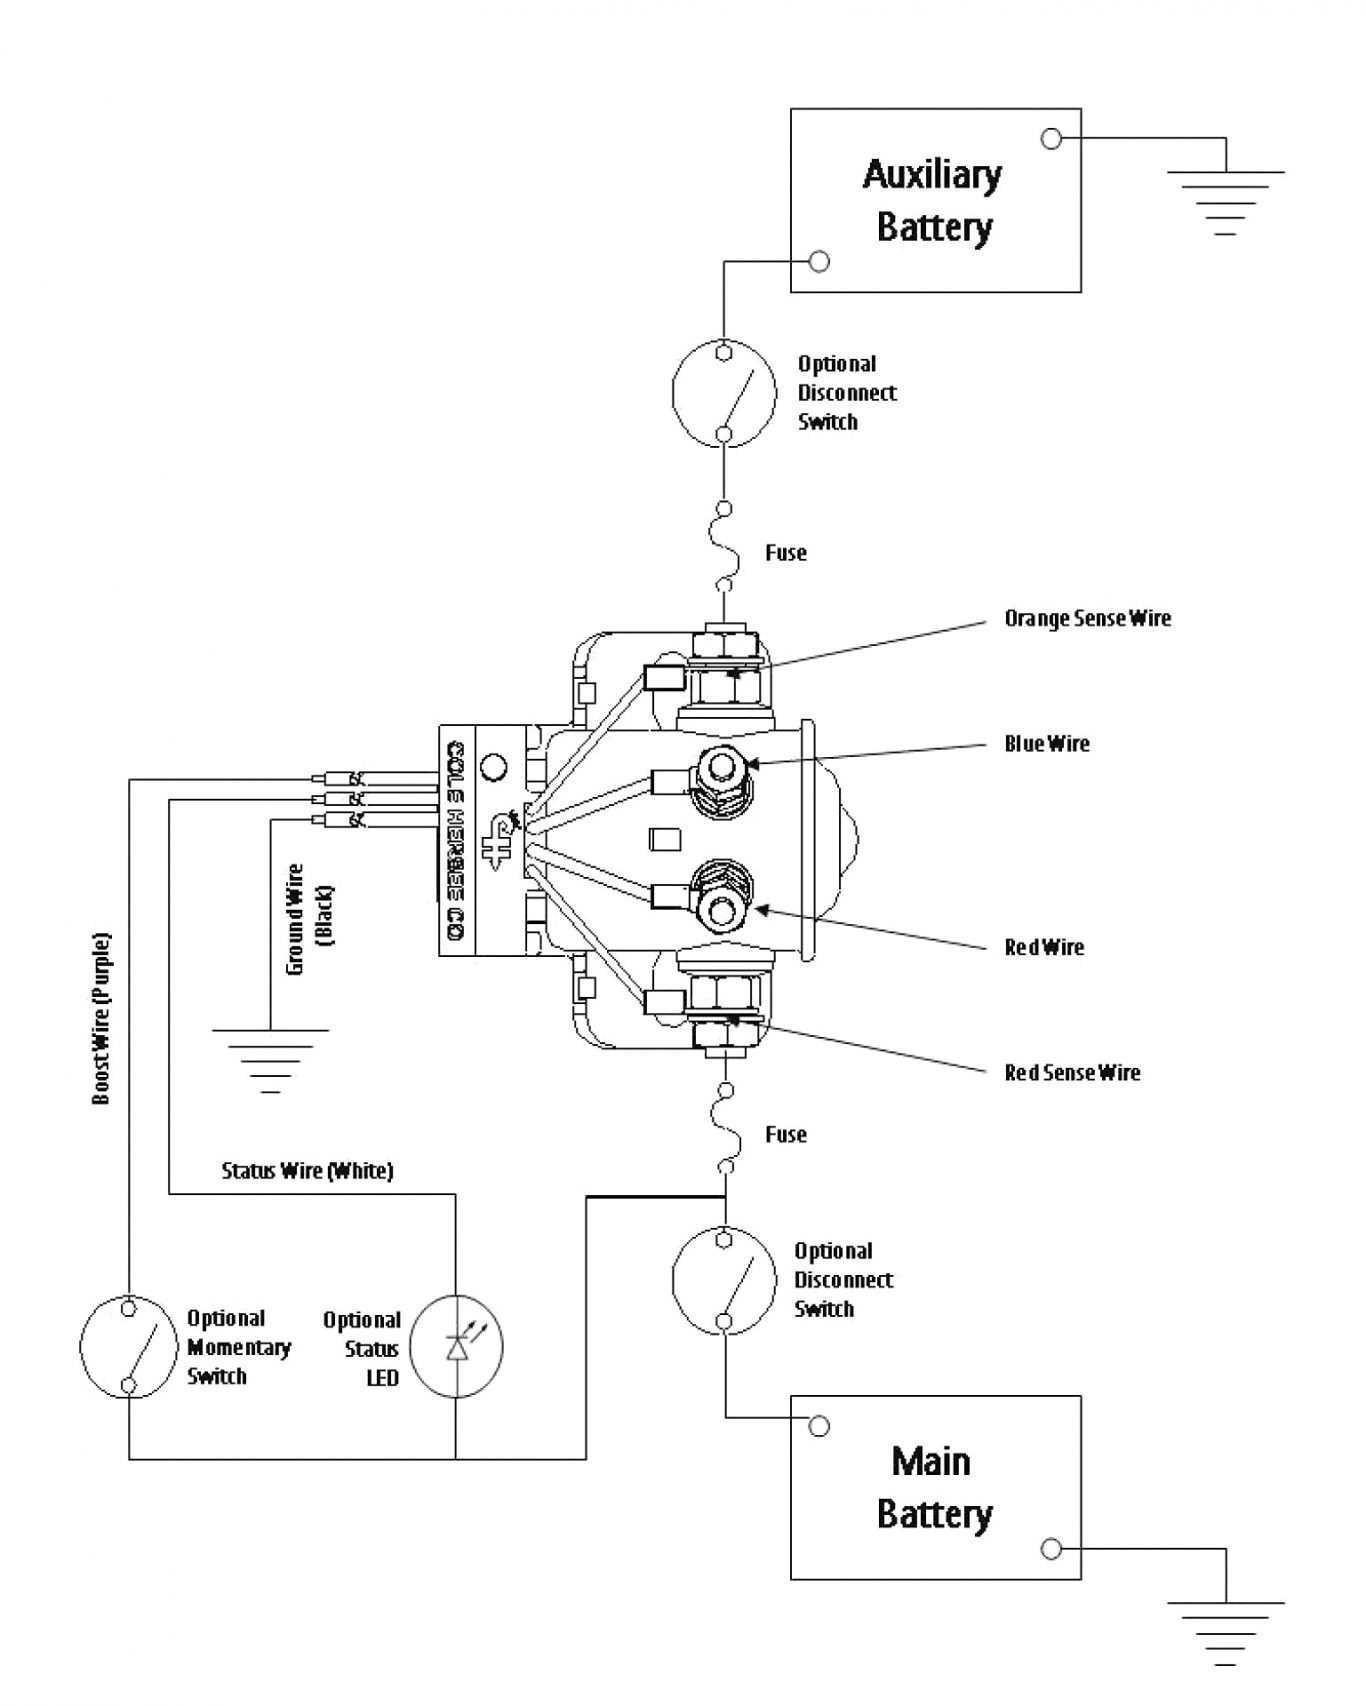 Car Stereo Radio Wiring Diagram Wiring Diagram for Car Audio Perfect Wiring Diagram for Car Stereo Of Car Stereo Radio Wiring Diagram